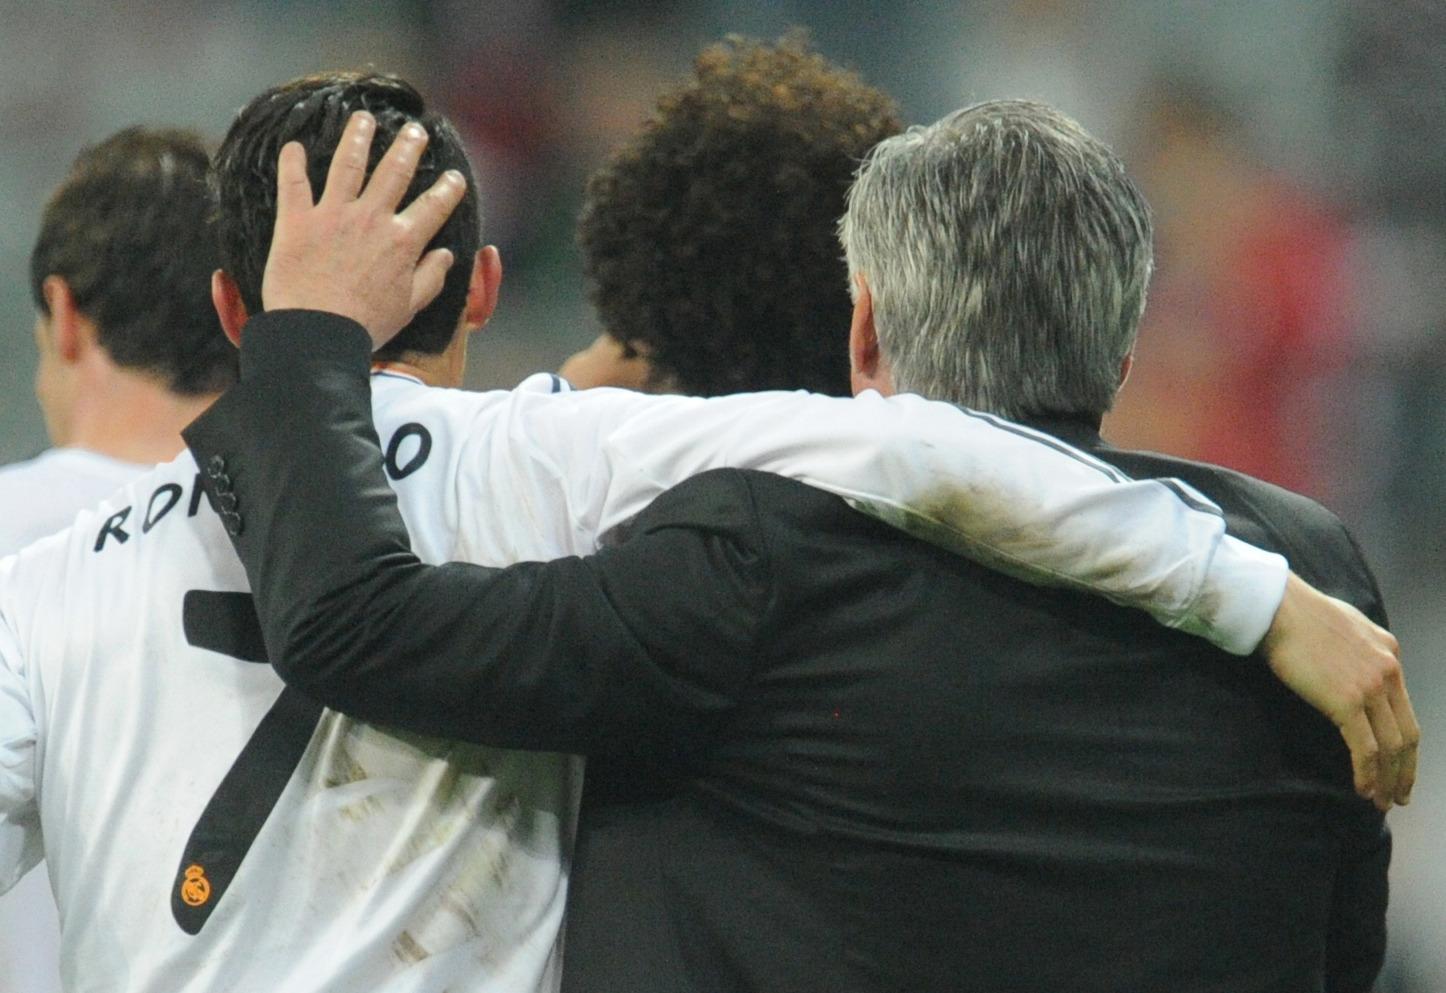 Ronaldo and Ancelotti together. Image: PA Images